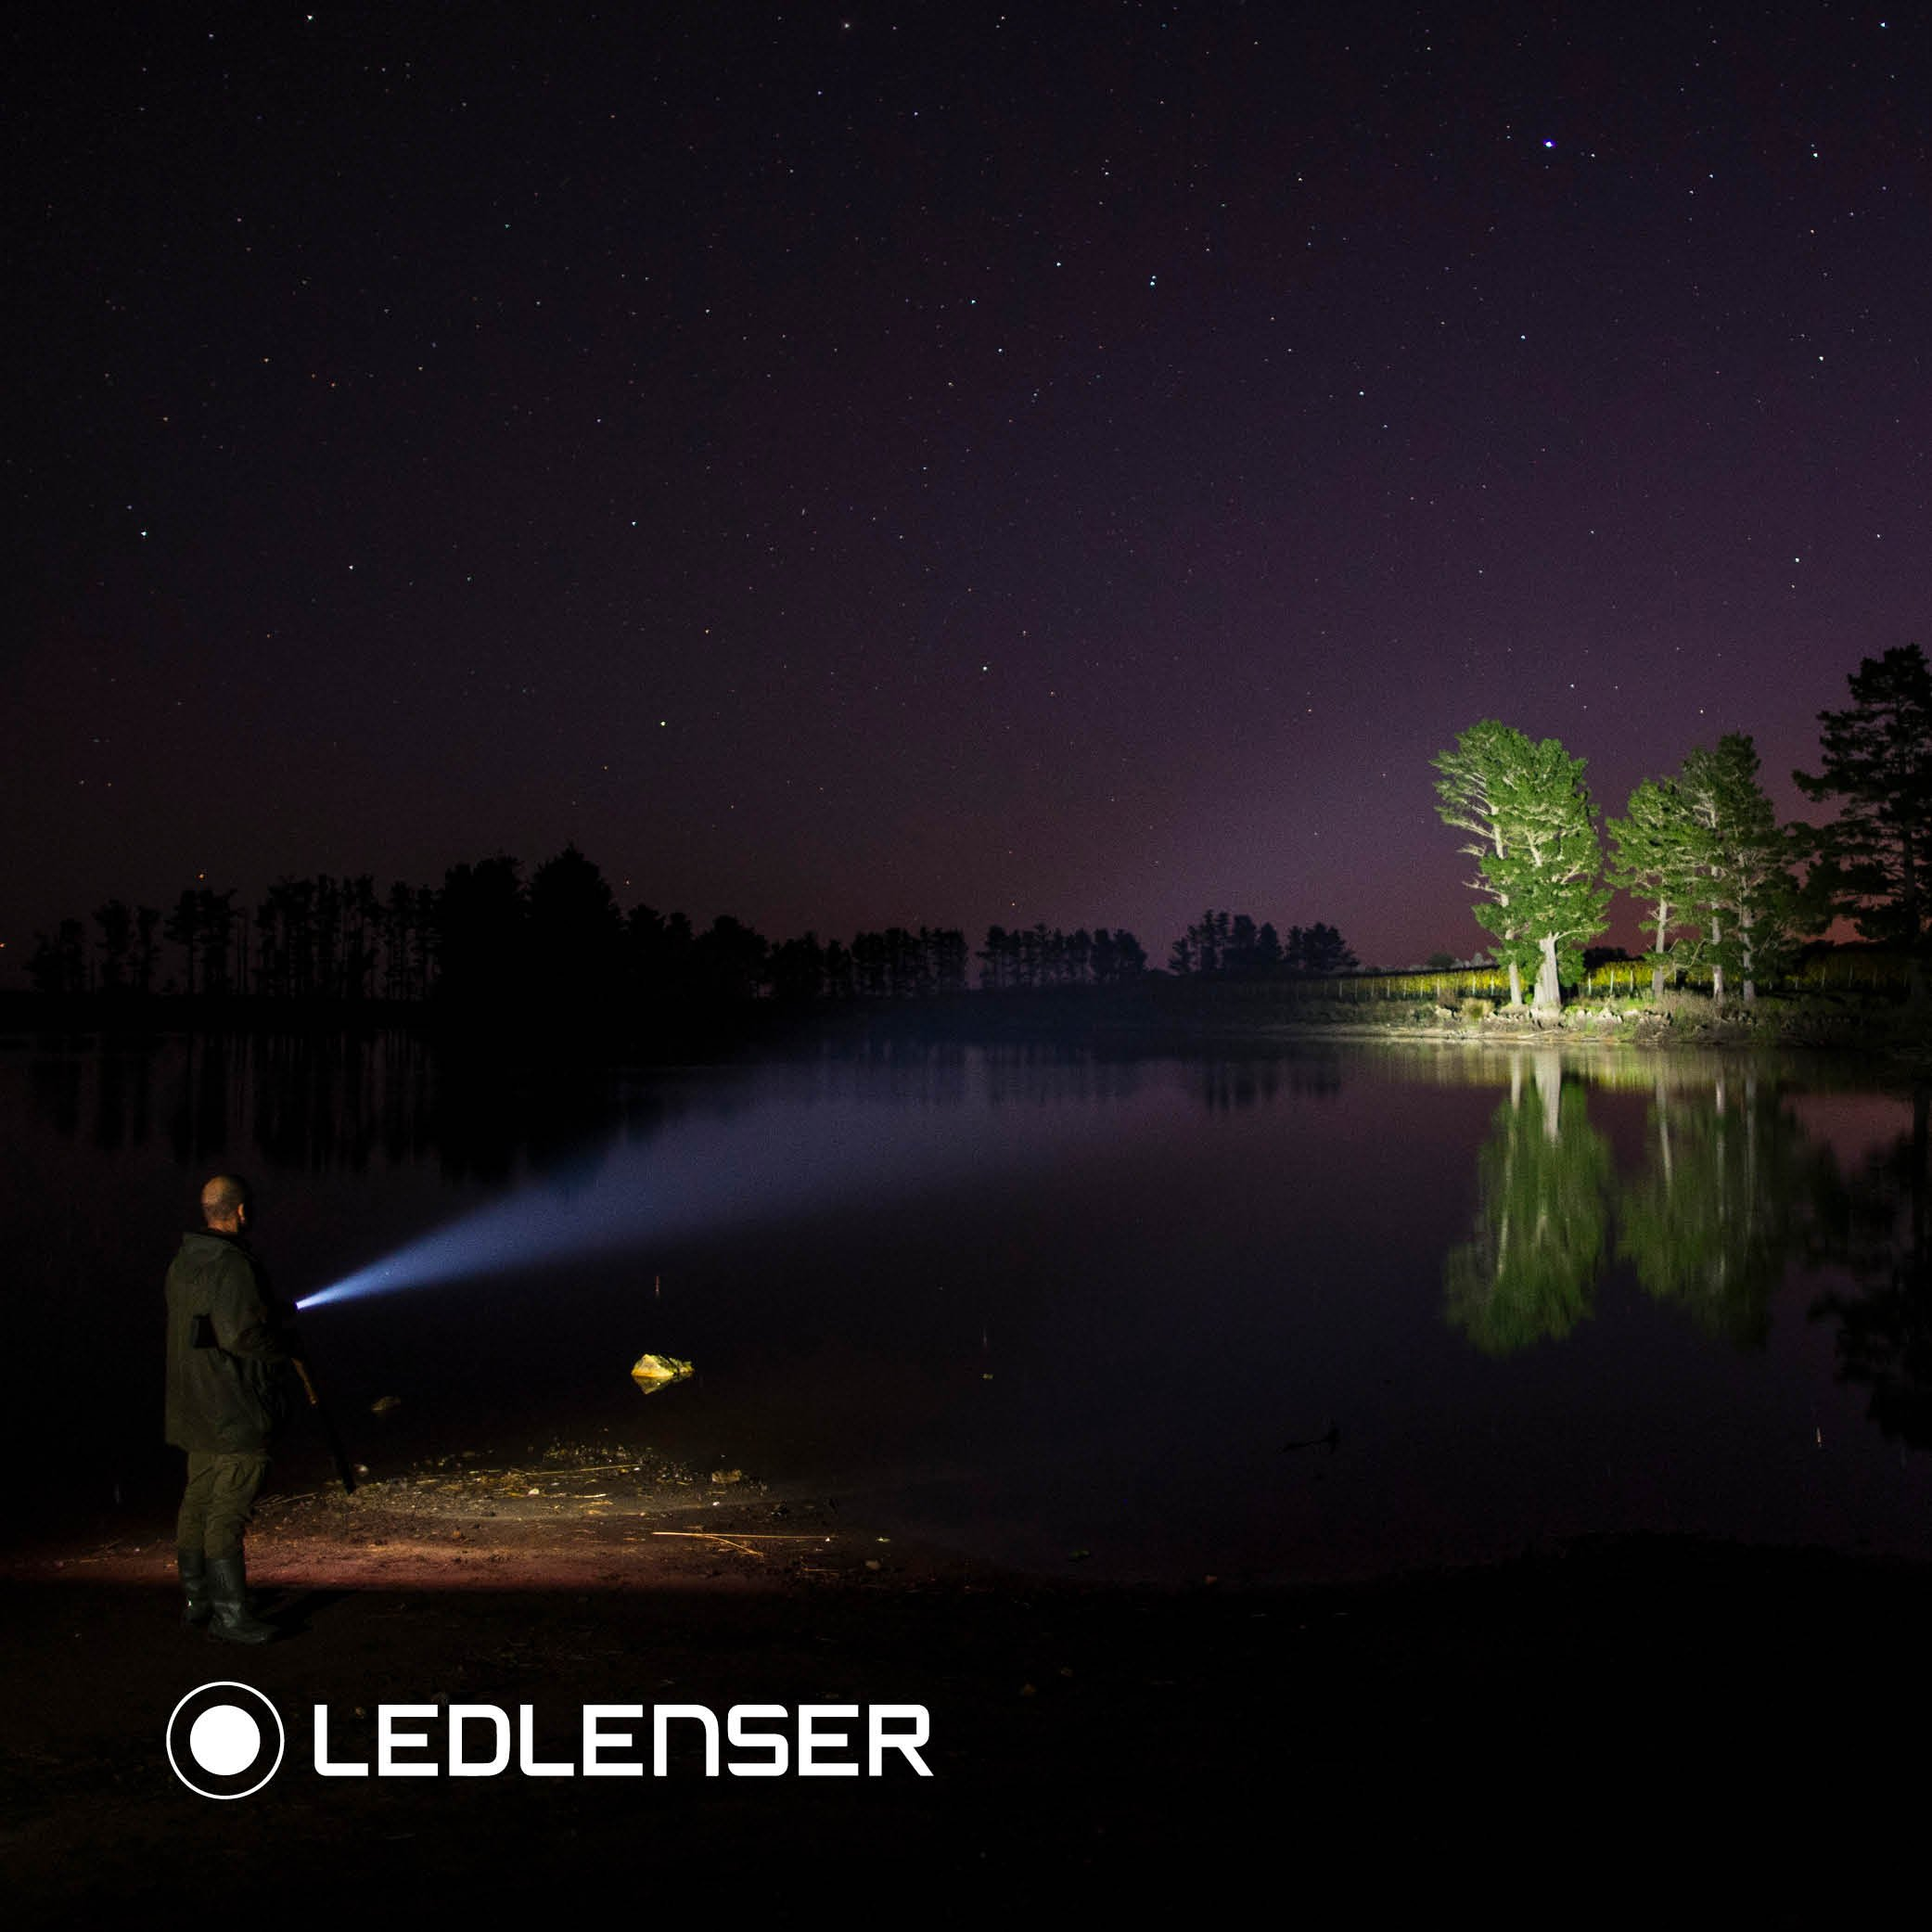 Led Lenser - 3000 Lumens, MT18 Flashlight with Rapid Focus System by LED Lenser (Image #9)